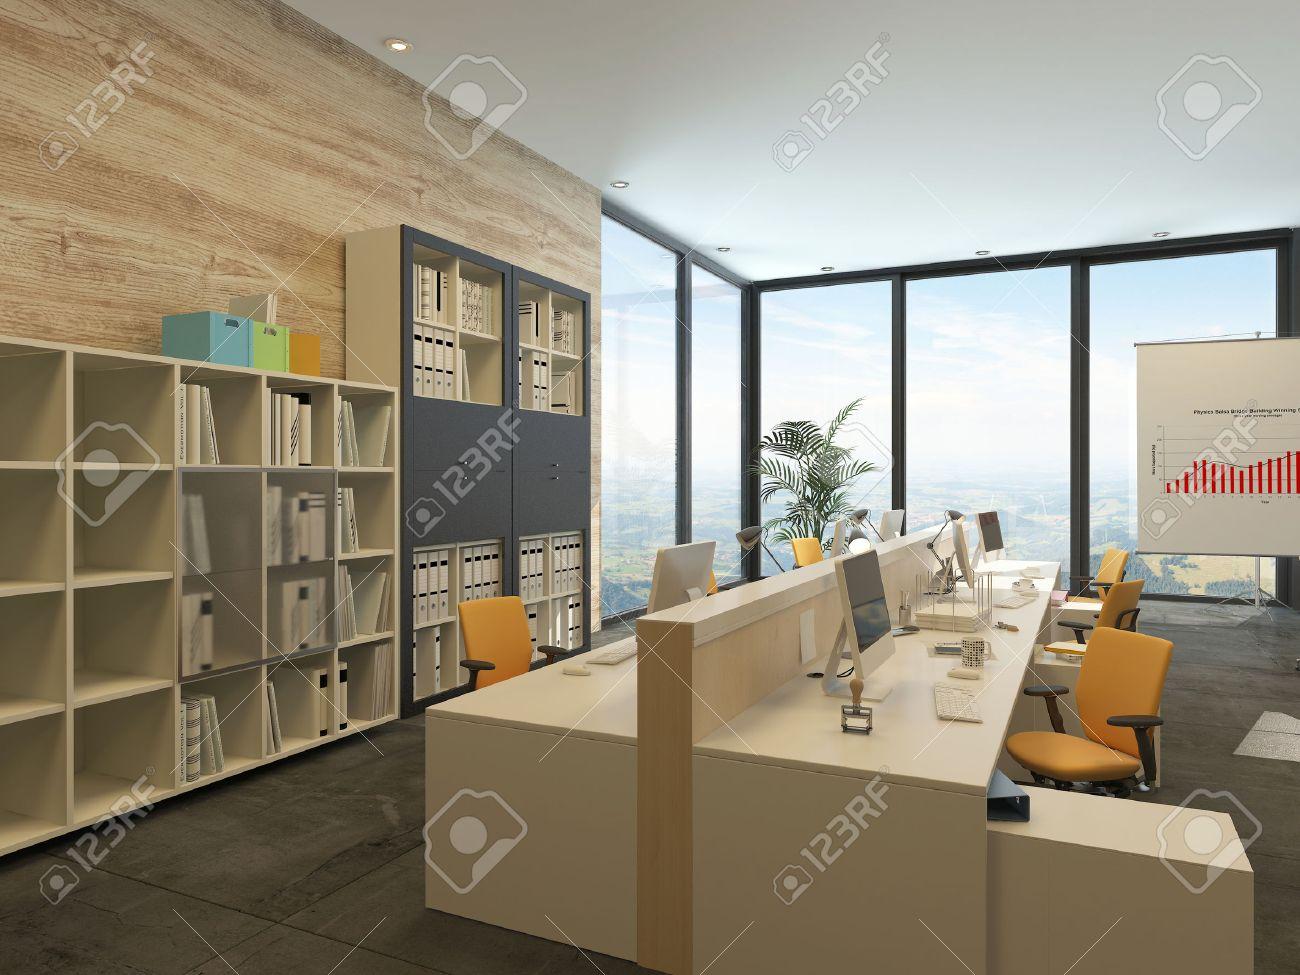 open floor office. Modern Open-plan Office With Multiple Workstations In A Spacious Room Floor-to Open Floor E